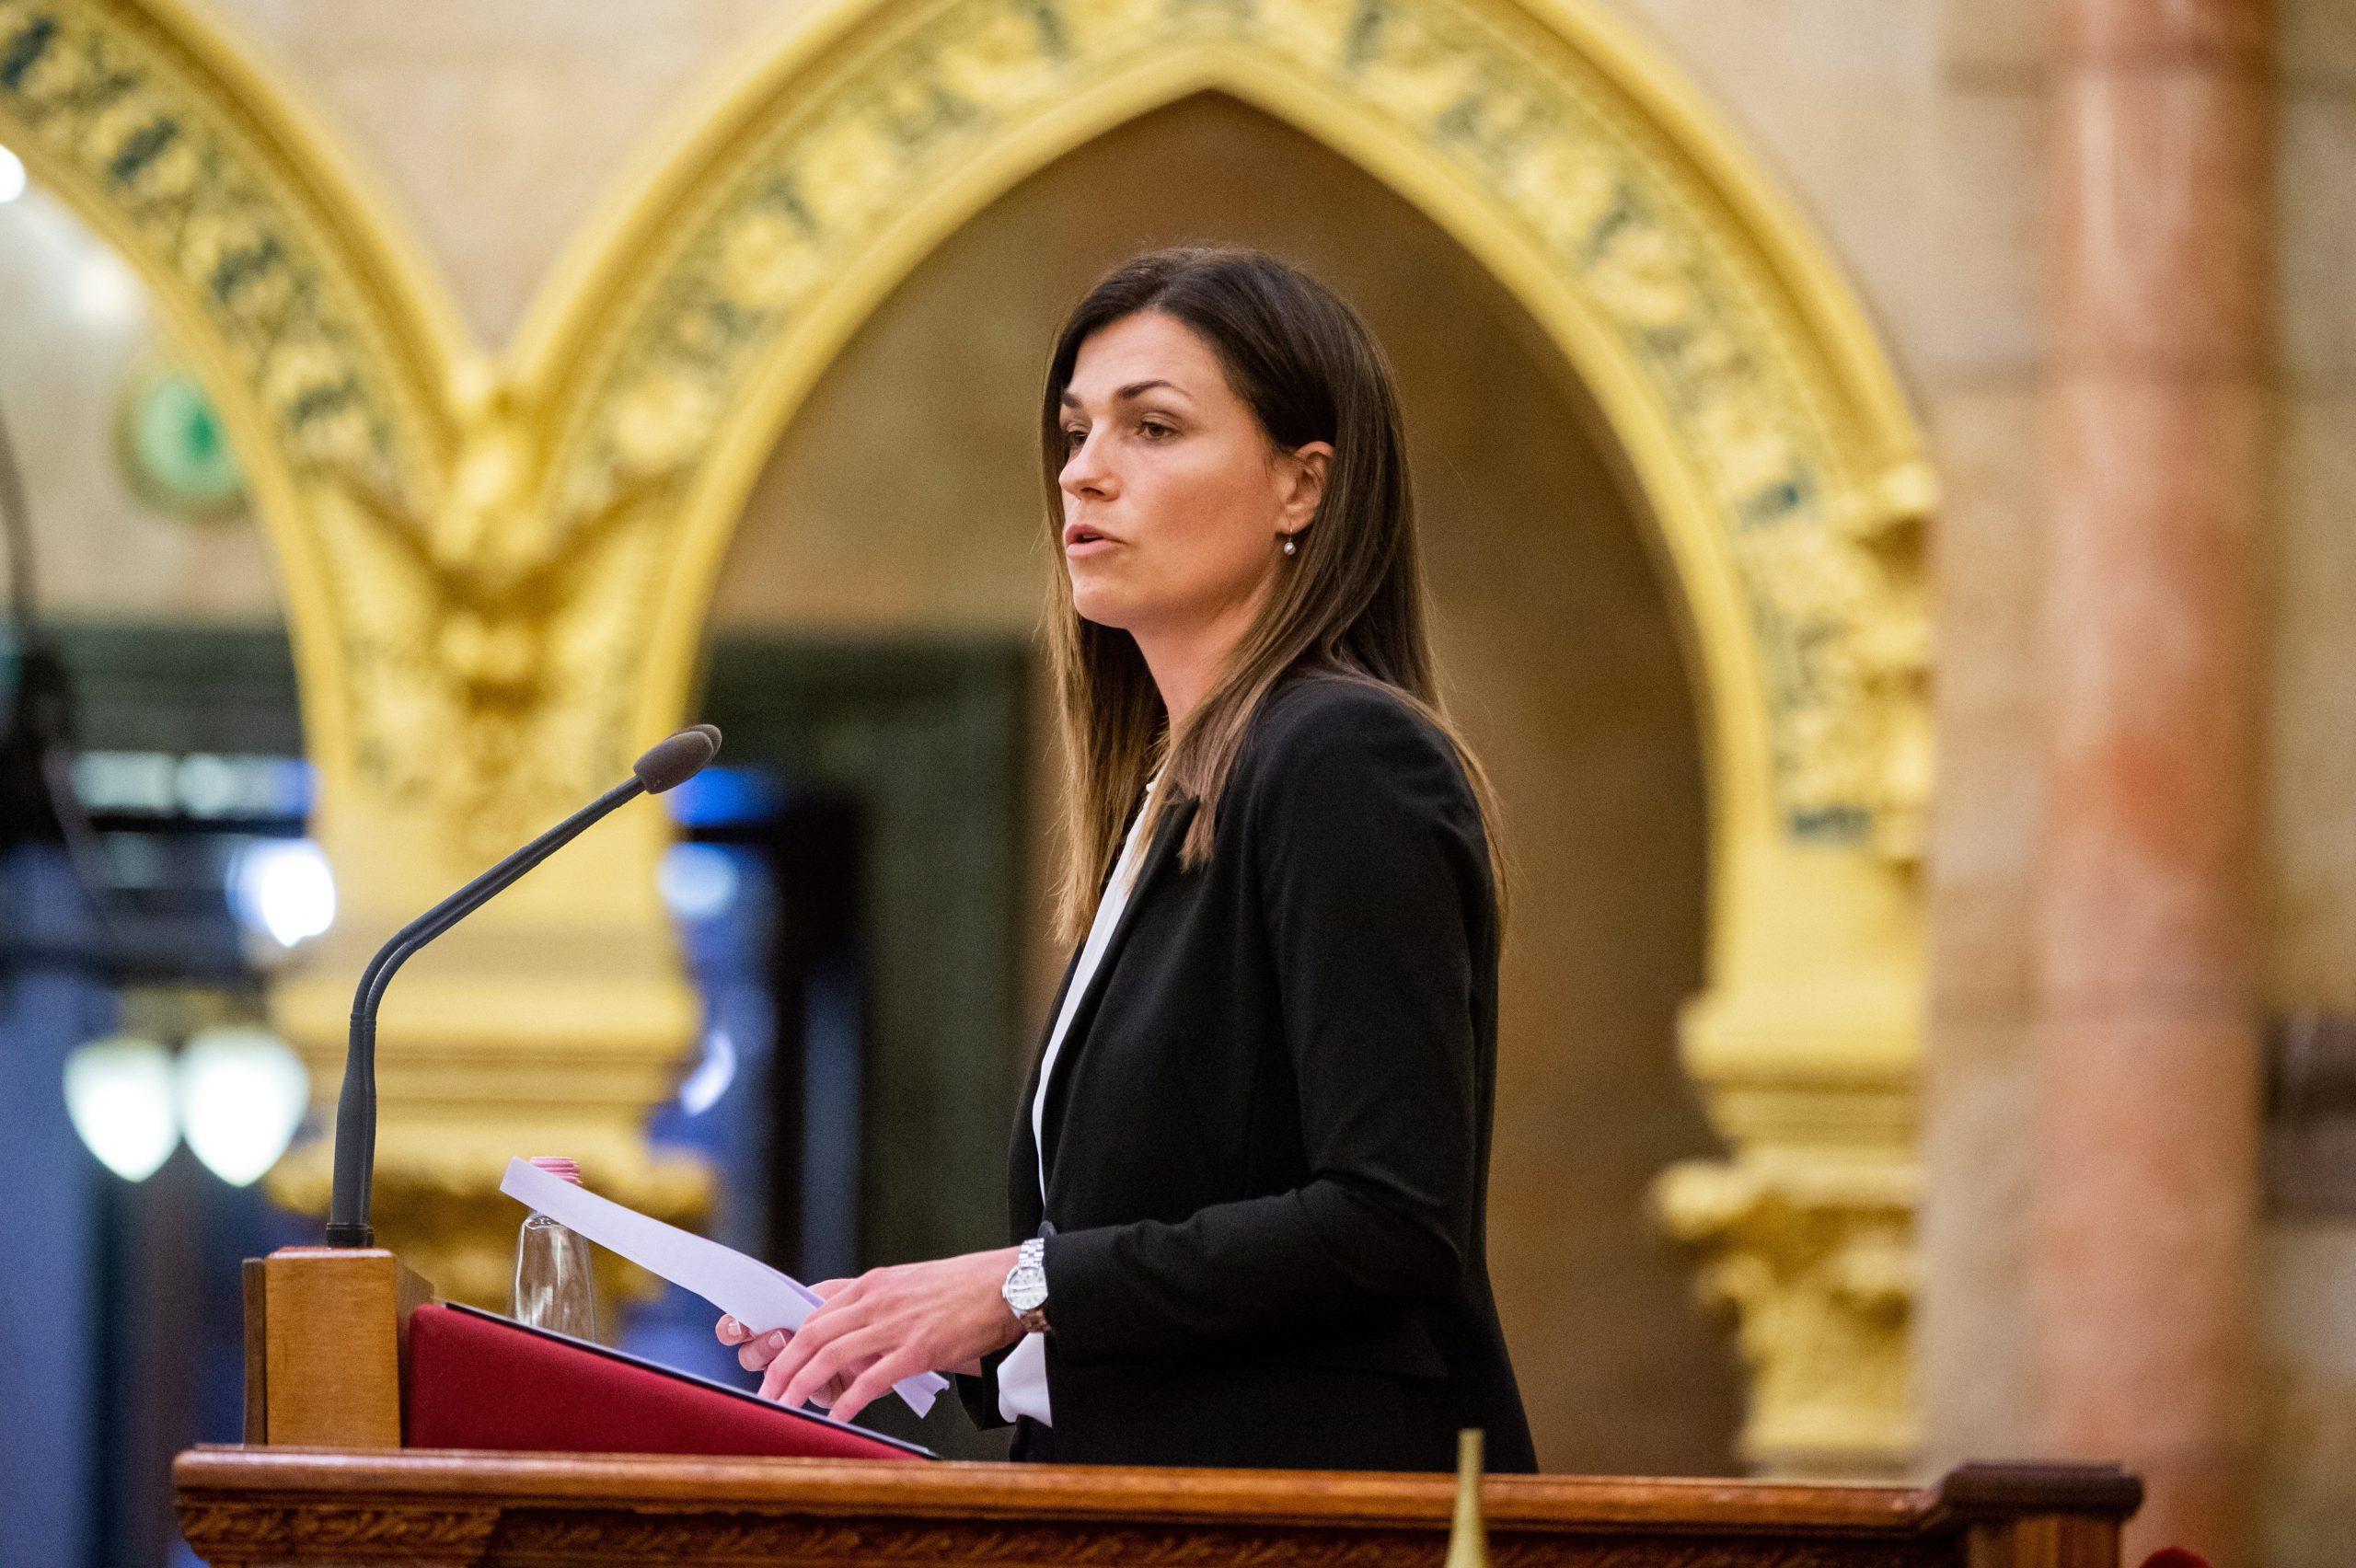 Justice Minister: EU Hostage to Ideological Debates